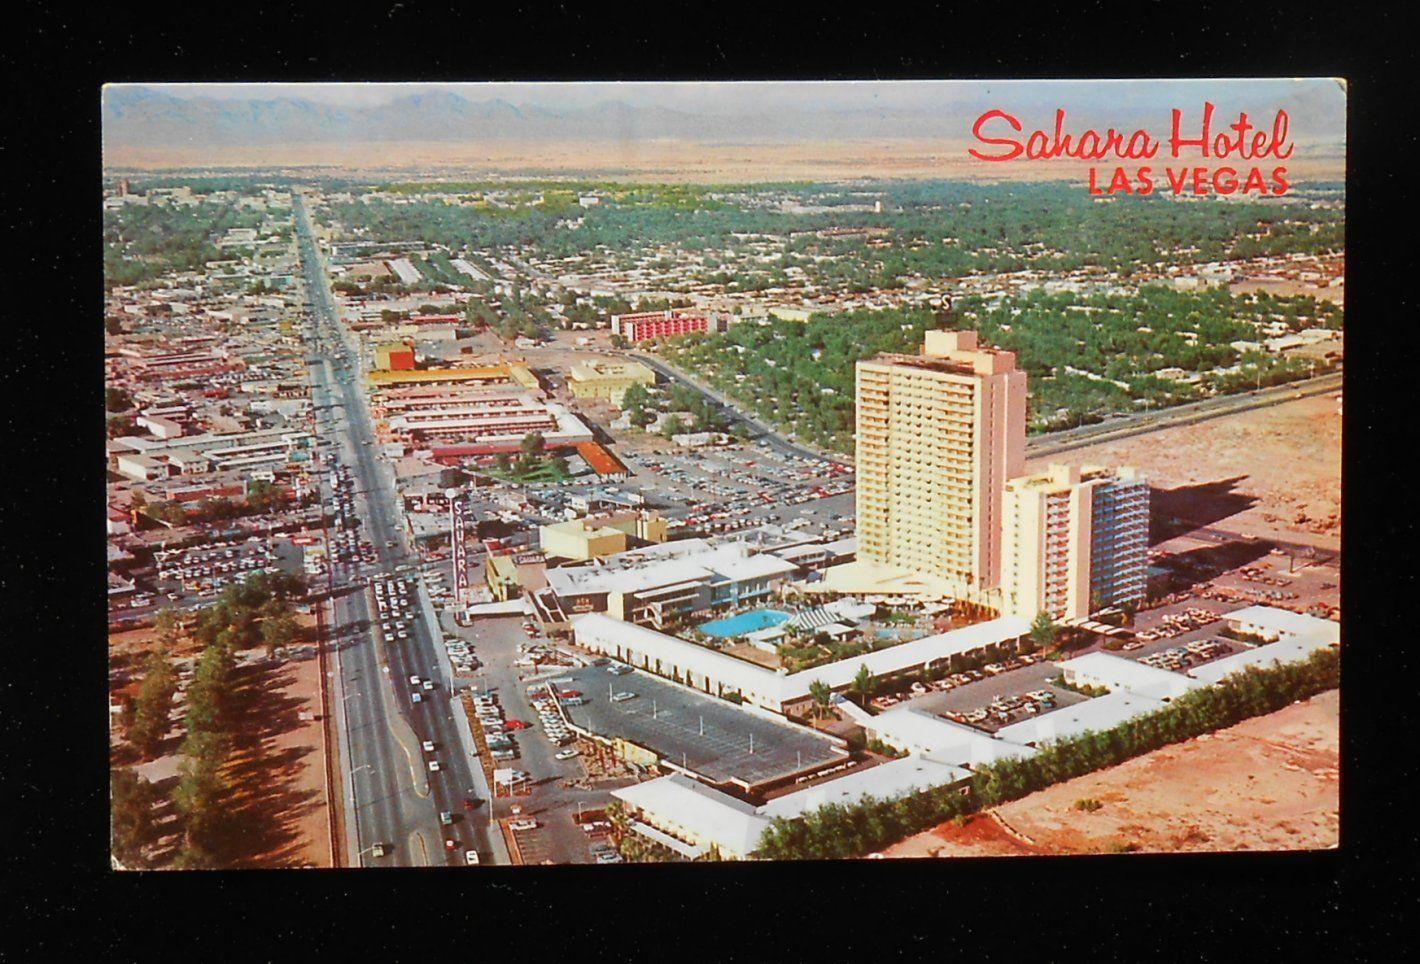 1950 S Aerial View Sahara Hotel Las Vegas Nv When The Sahara Was